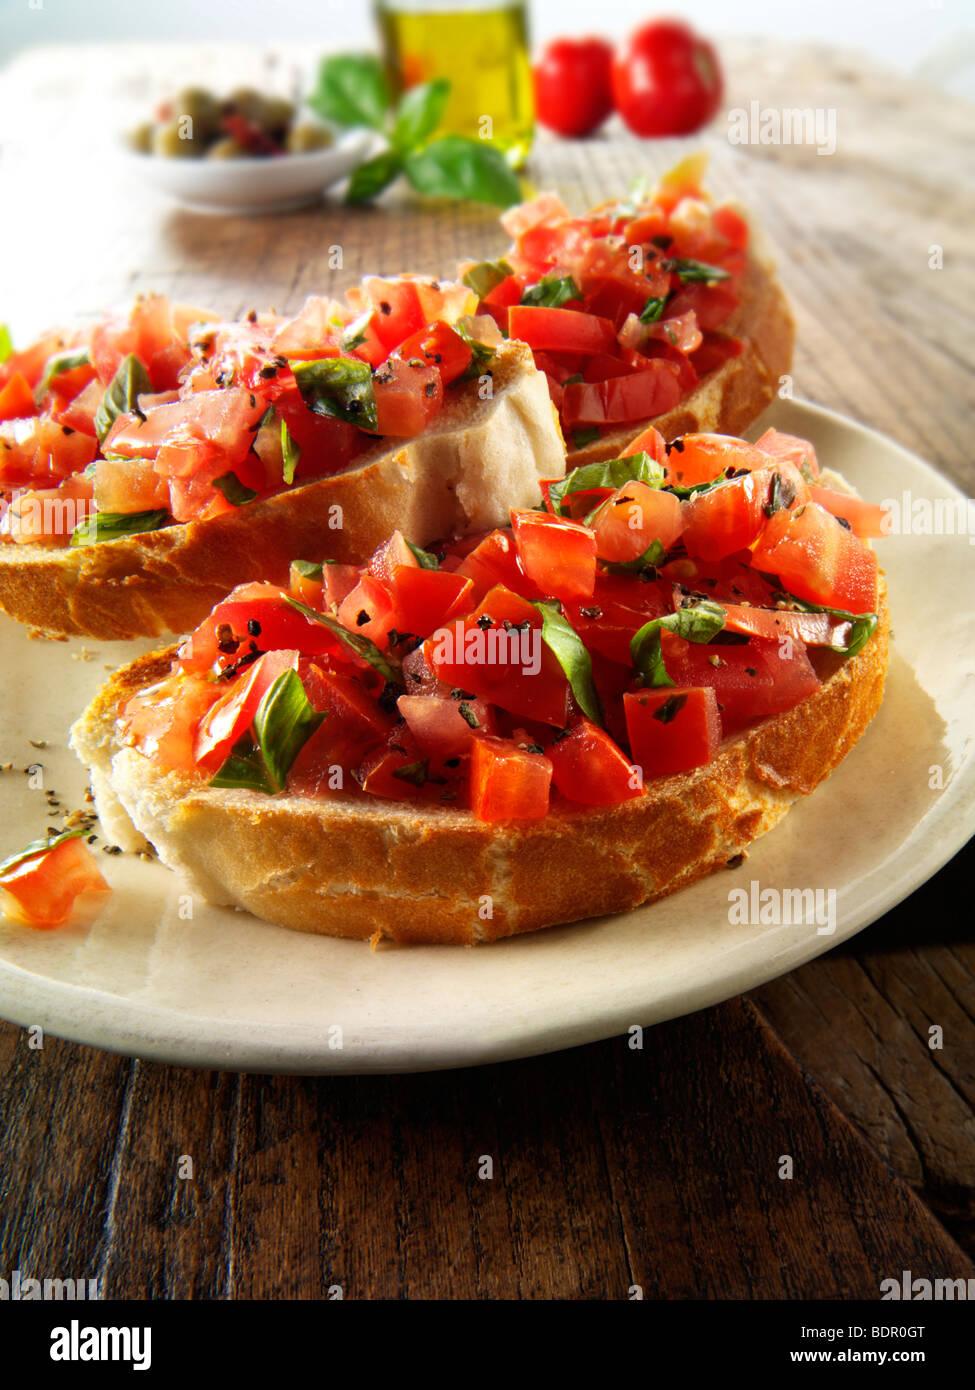 Bruschettas aux tomates Beefsteak haché frais Photo Stock